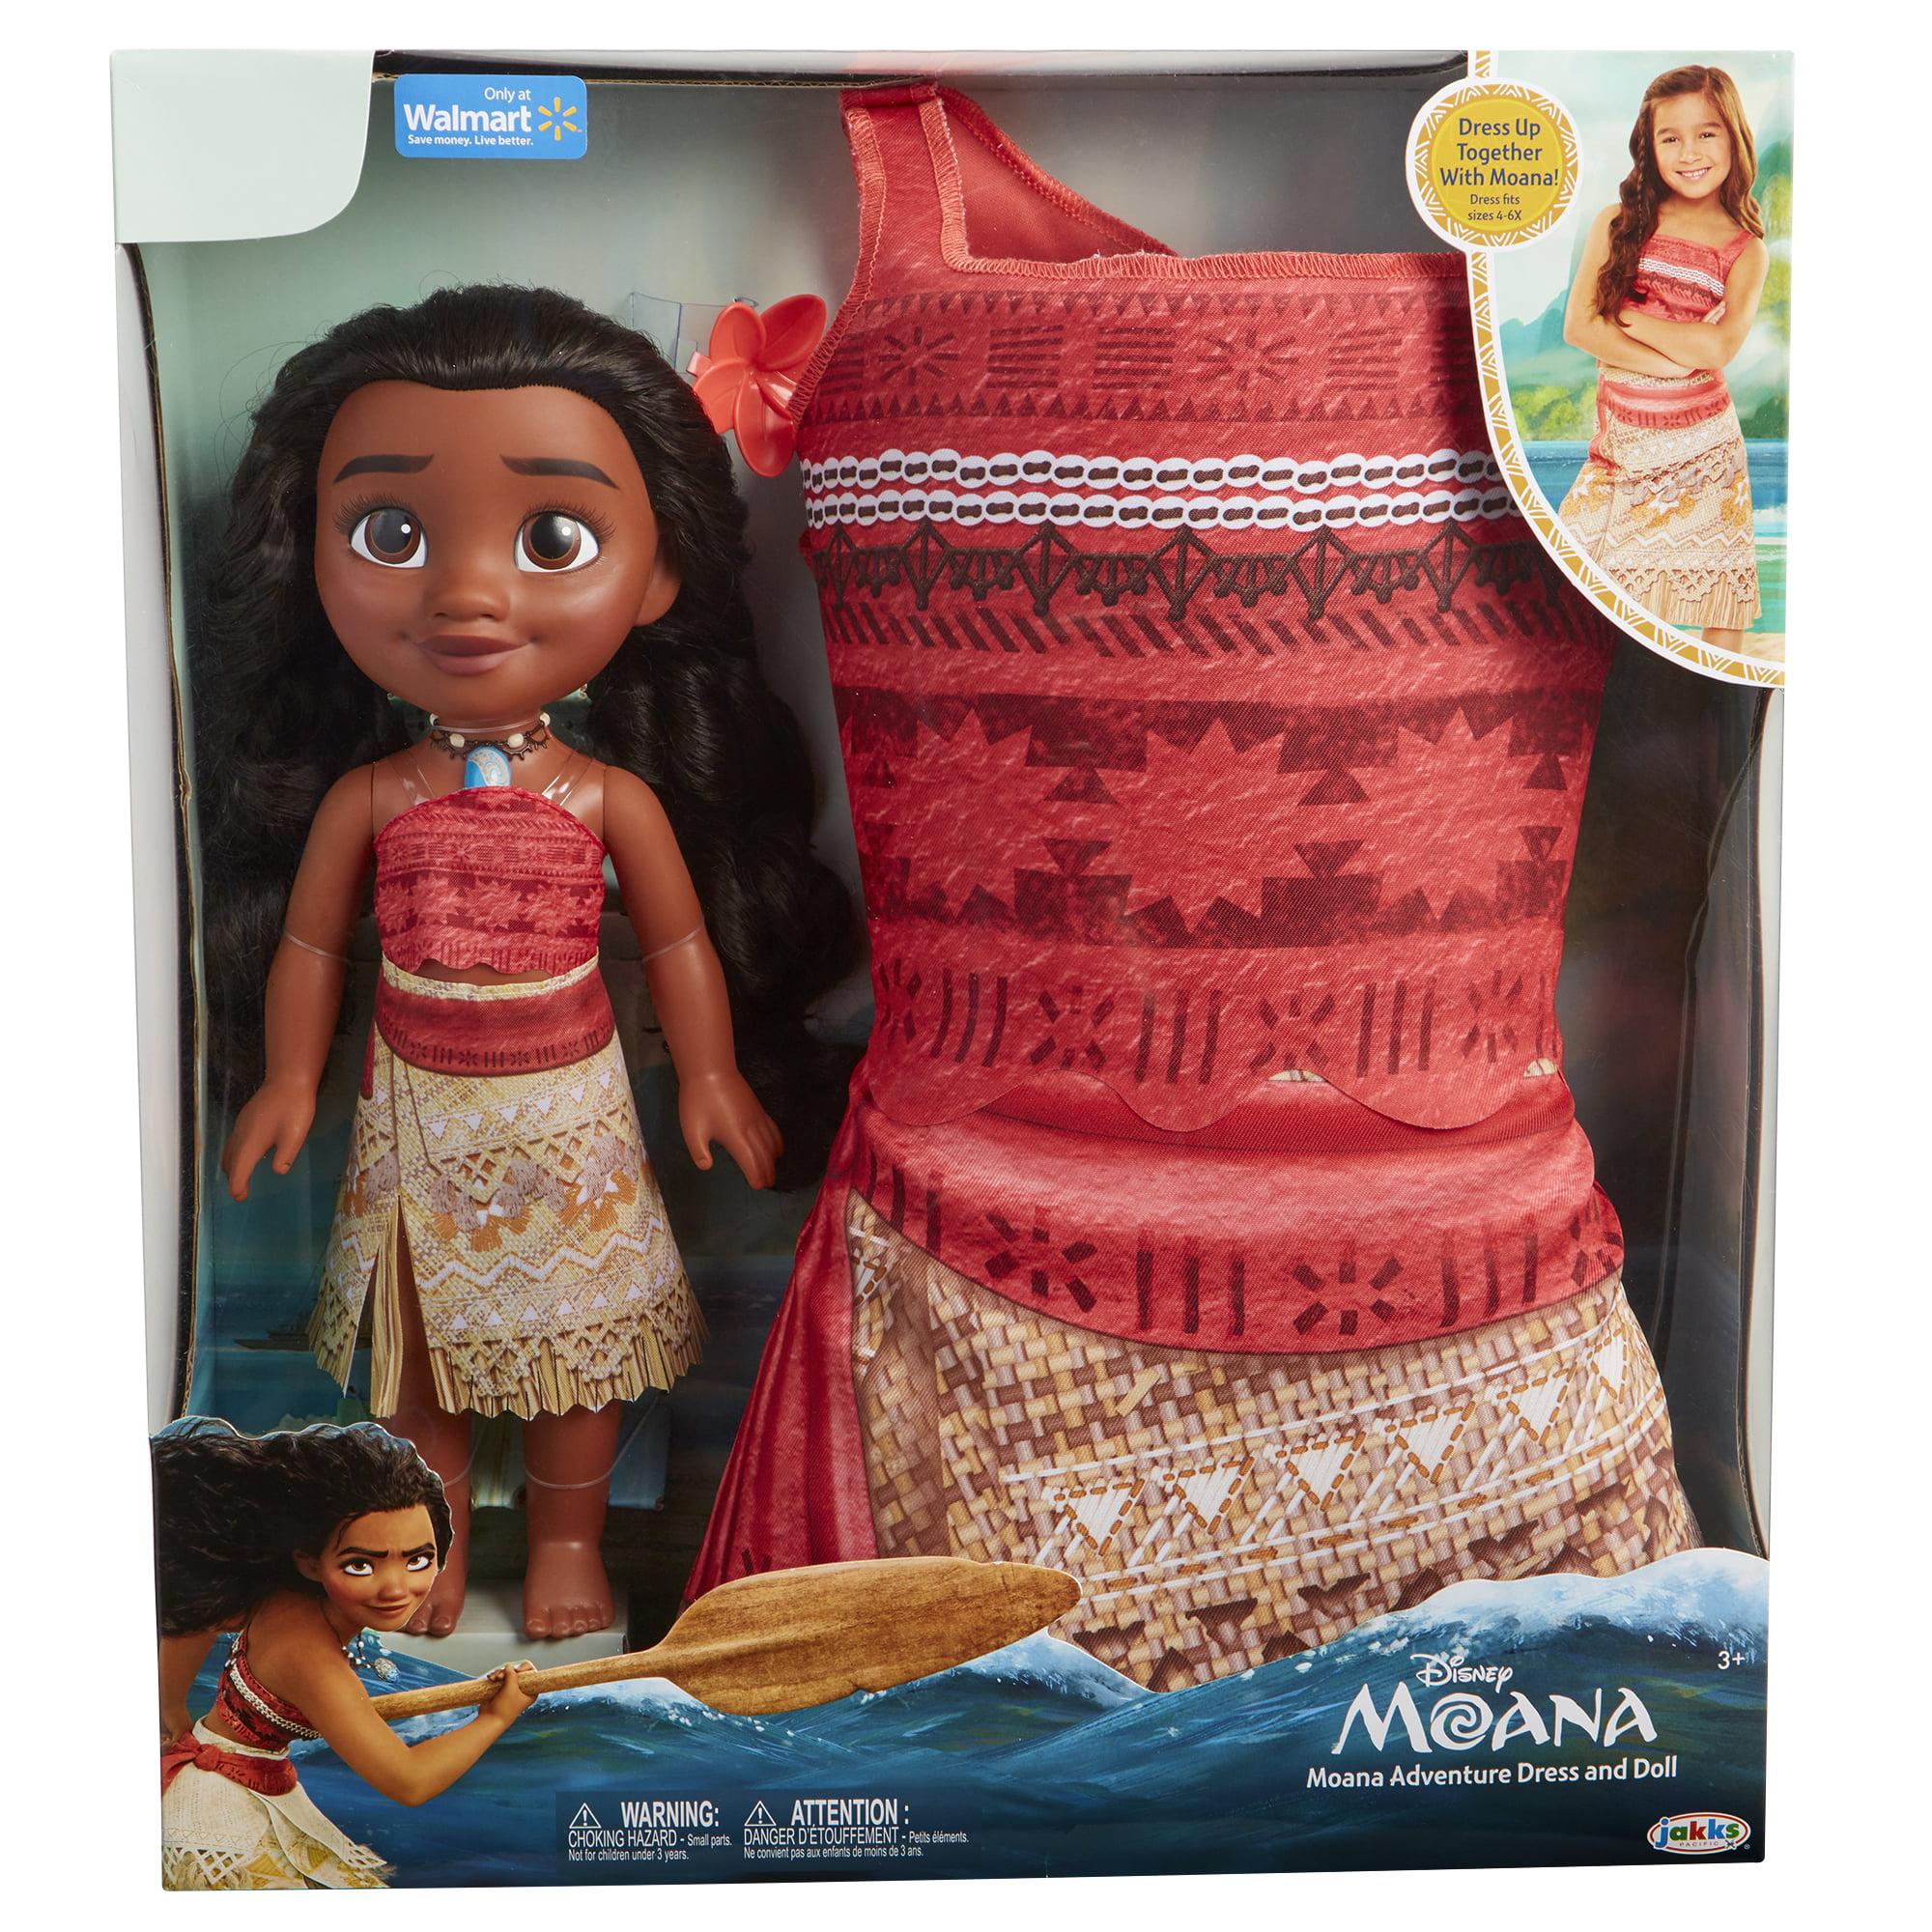 Disney Princess Moana Toddler Doll And Dress   Walmart.com